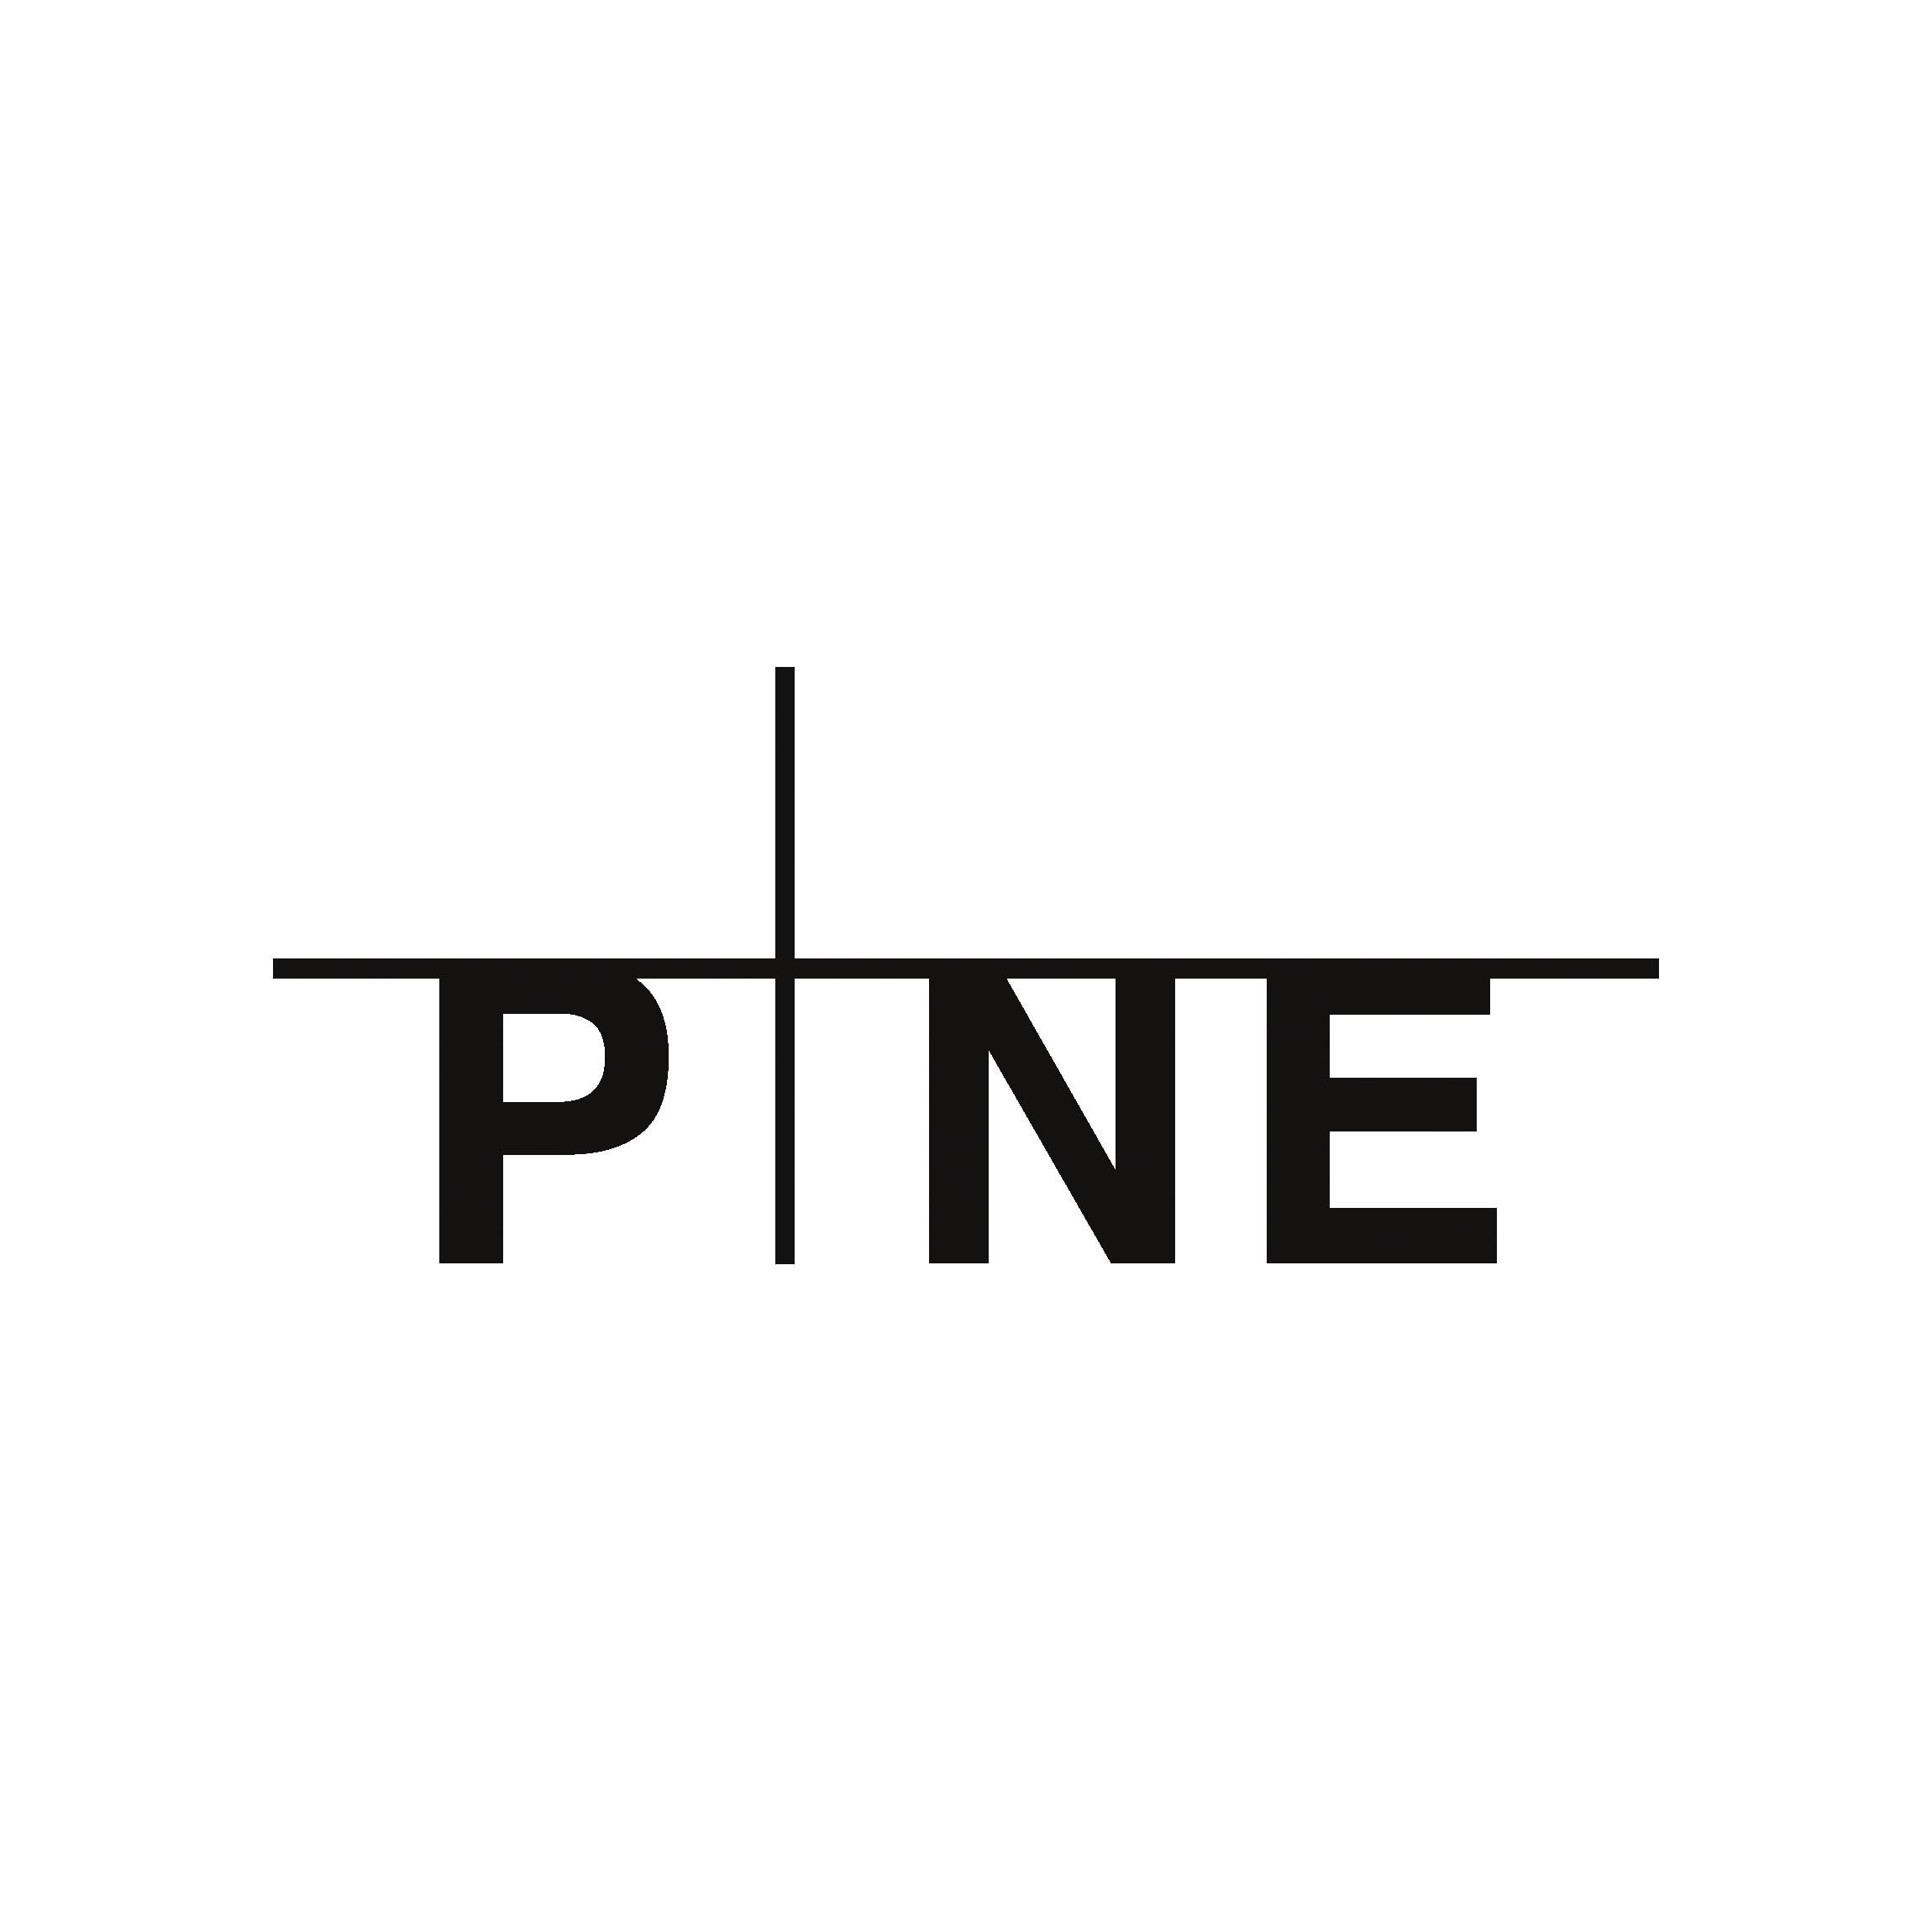 PINE2018_01